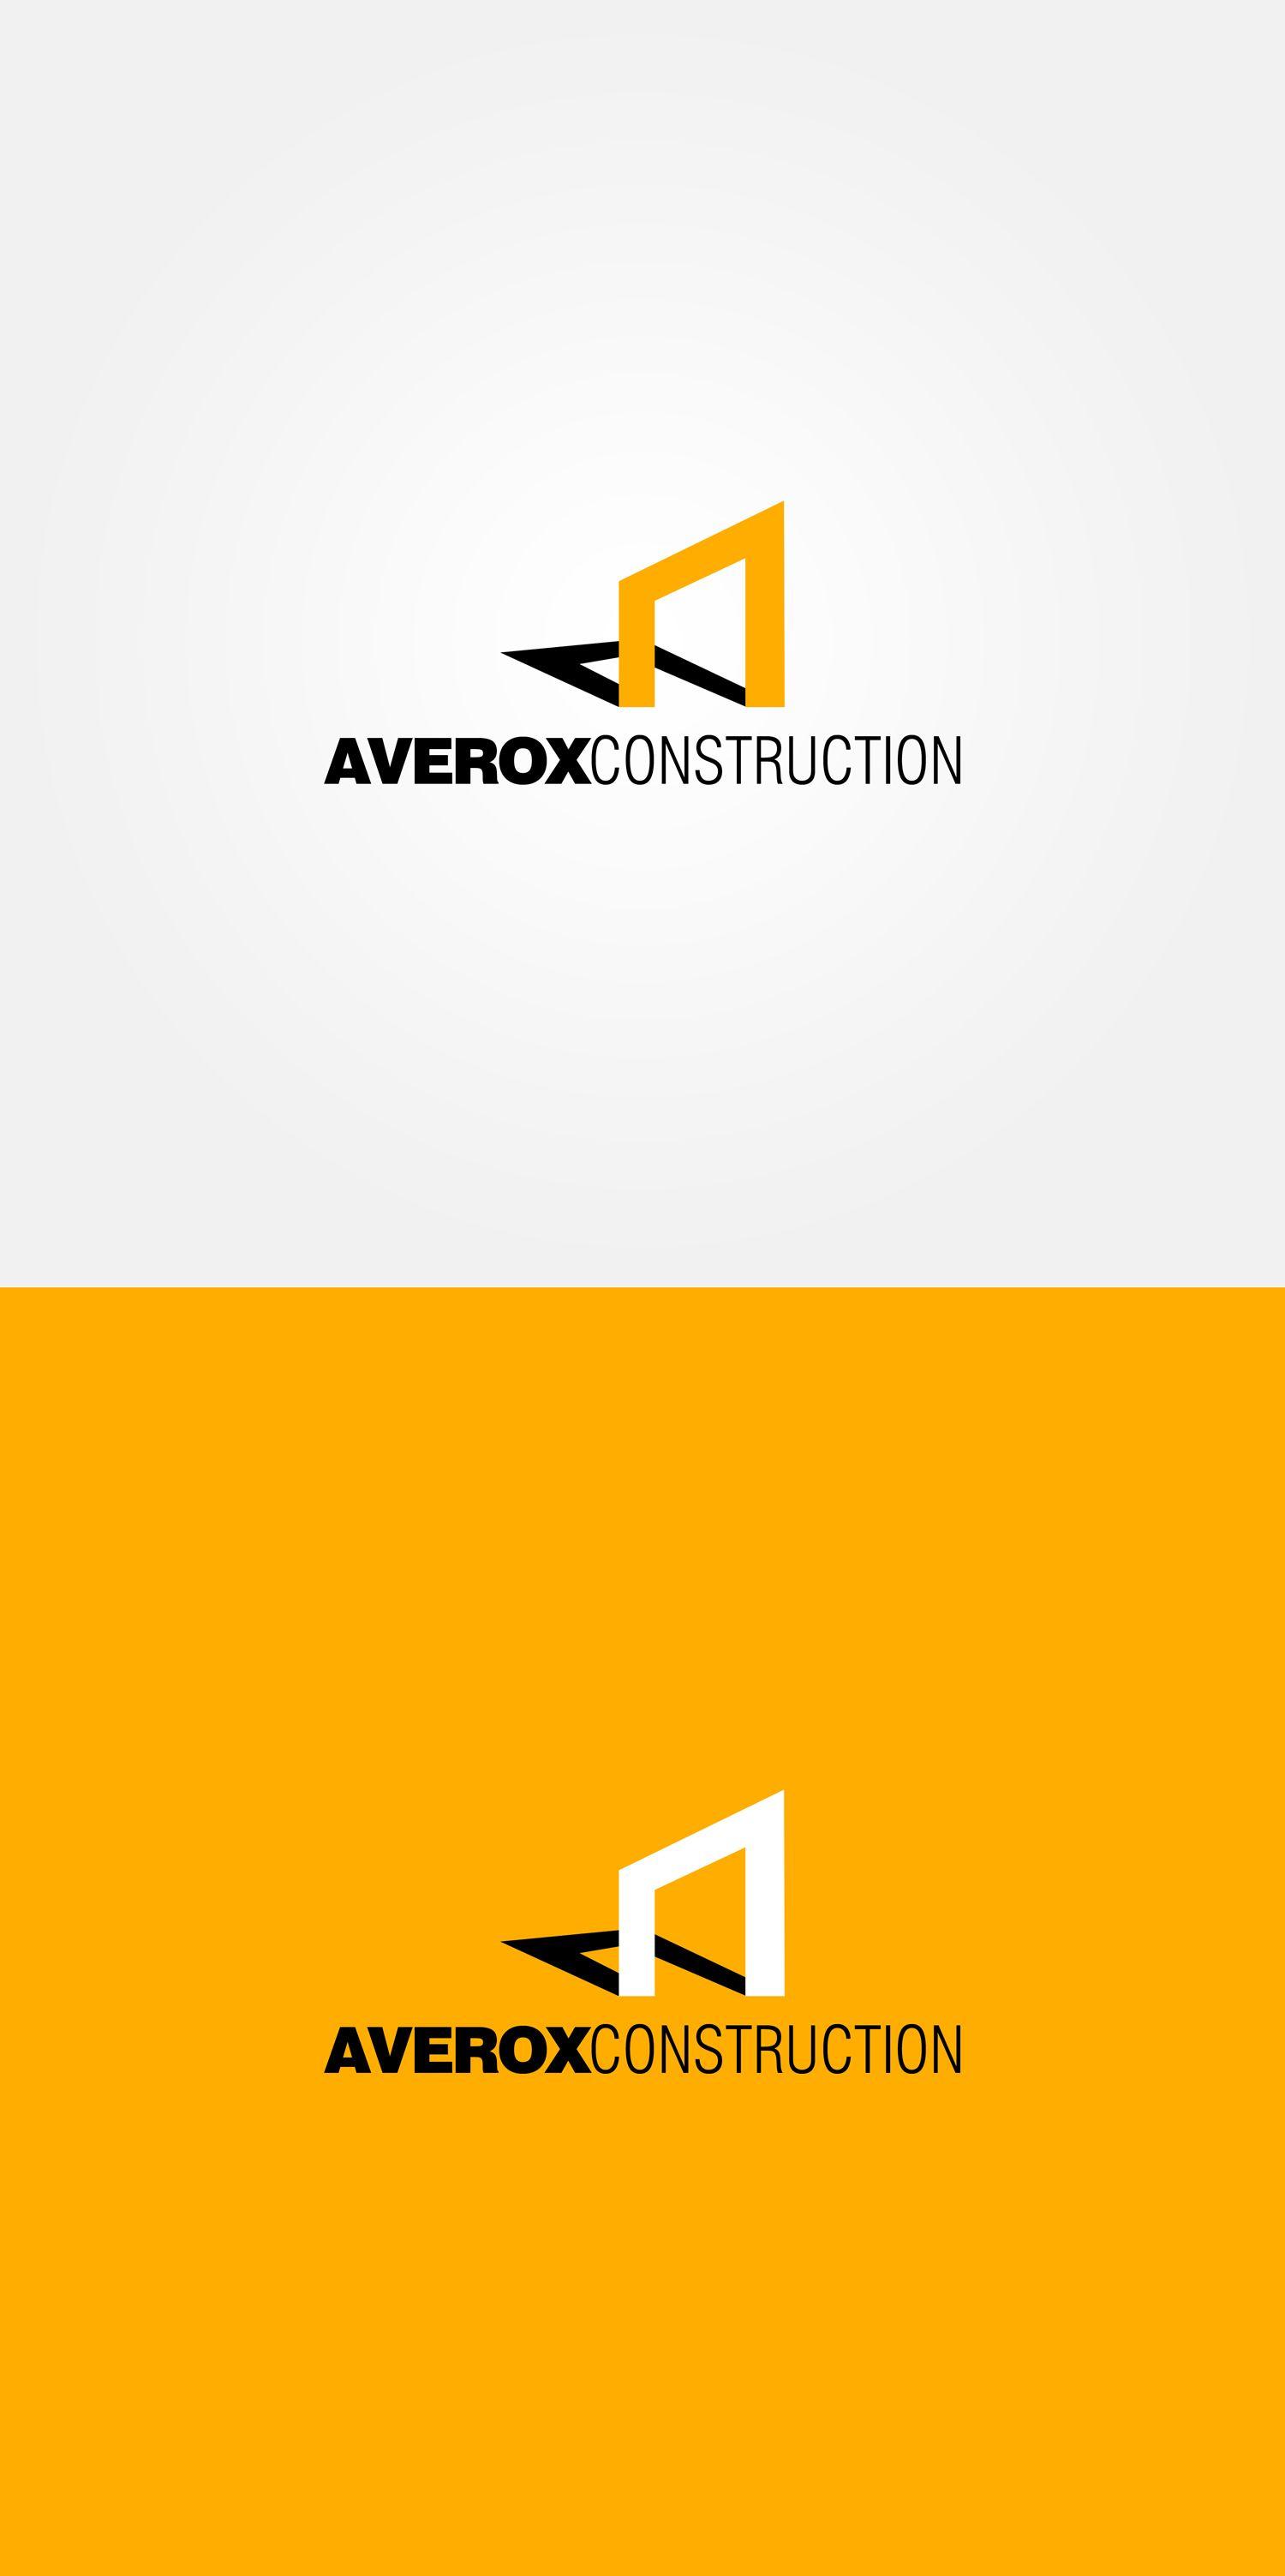 logo designs pinterest logo design construction company logo and